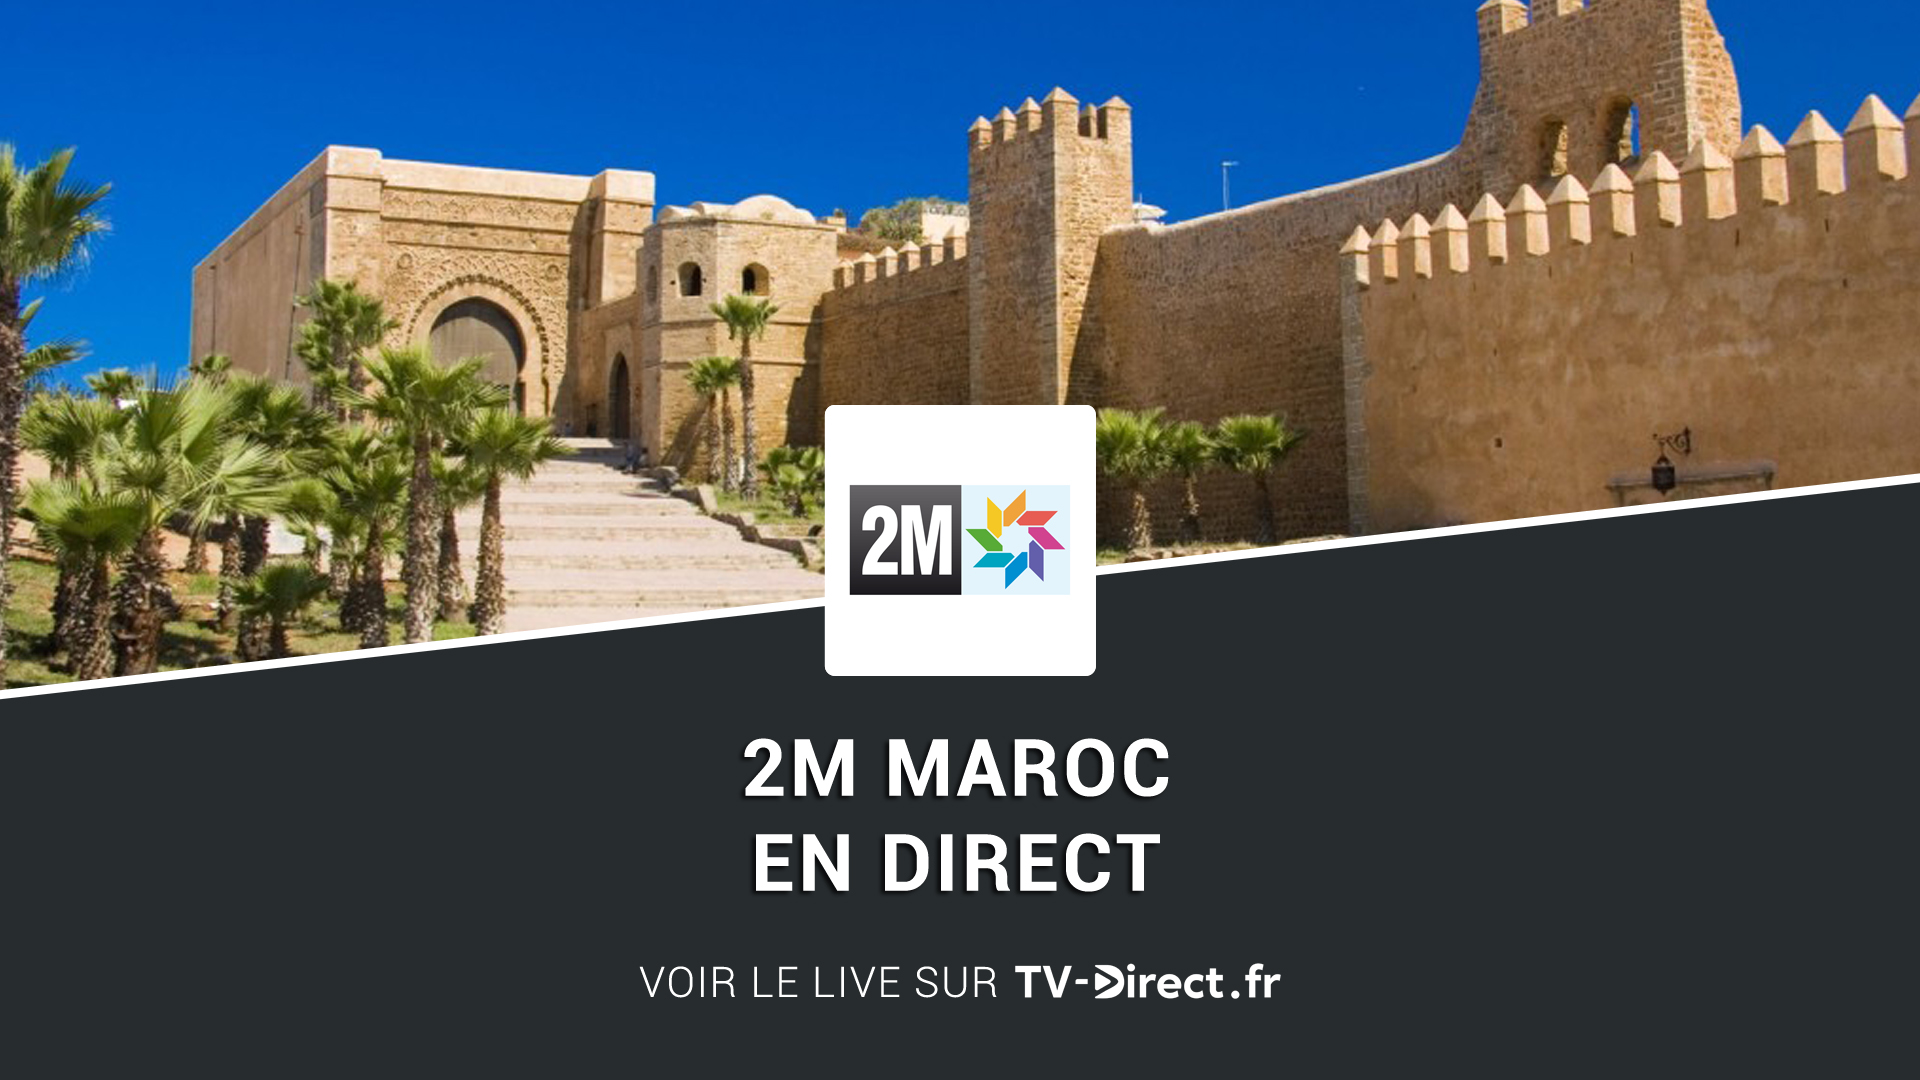 Maroc chat tv nilesat